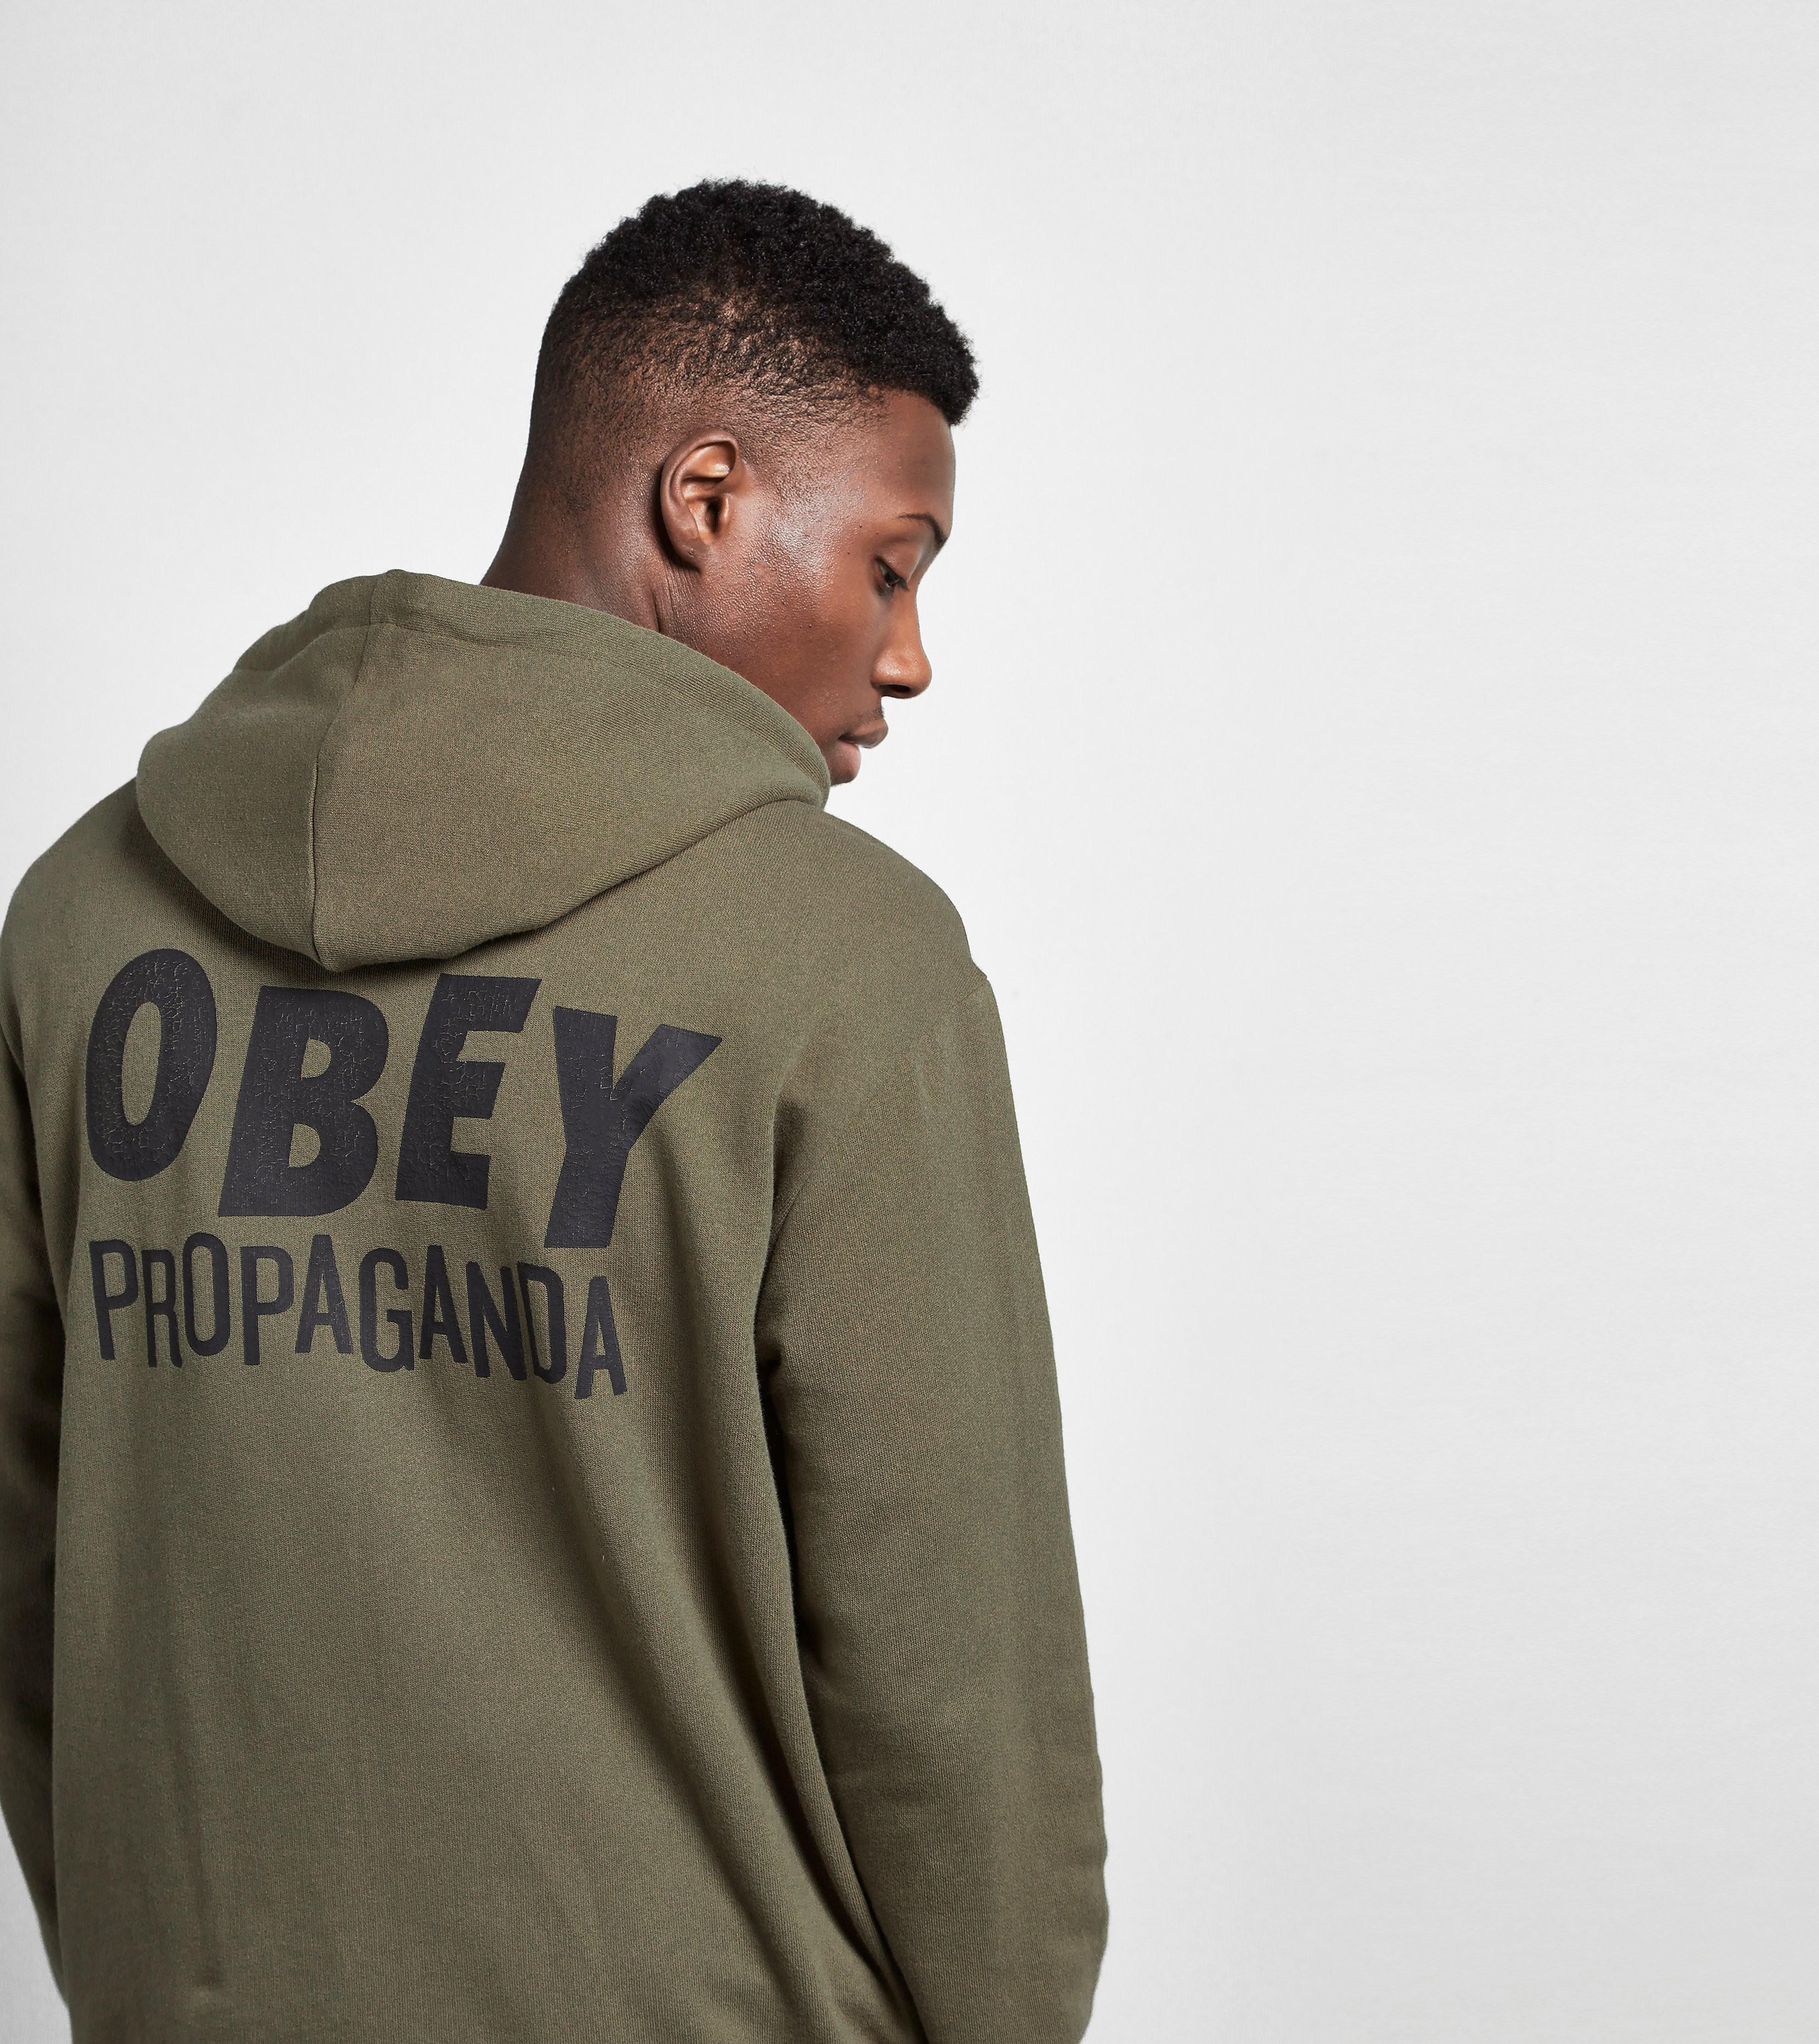 Obey Propaganda Bars Hoody